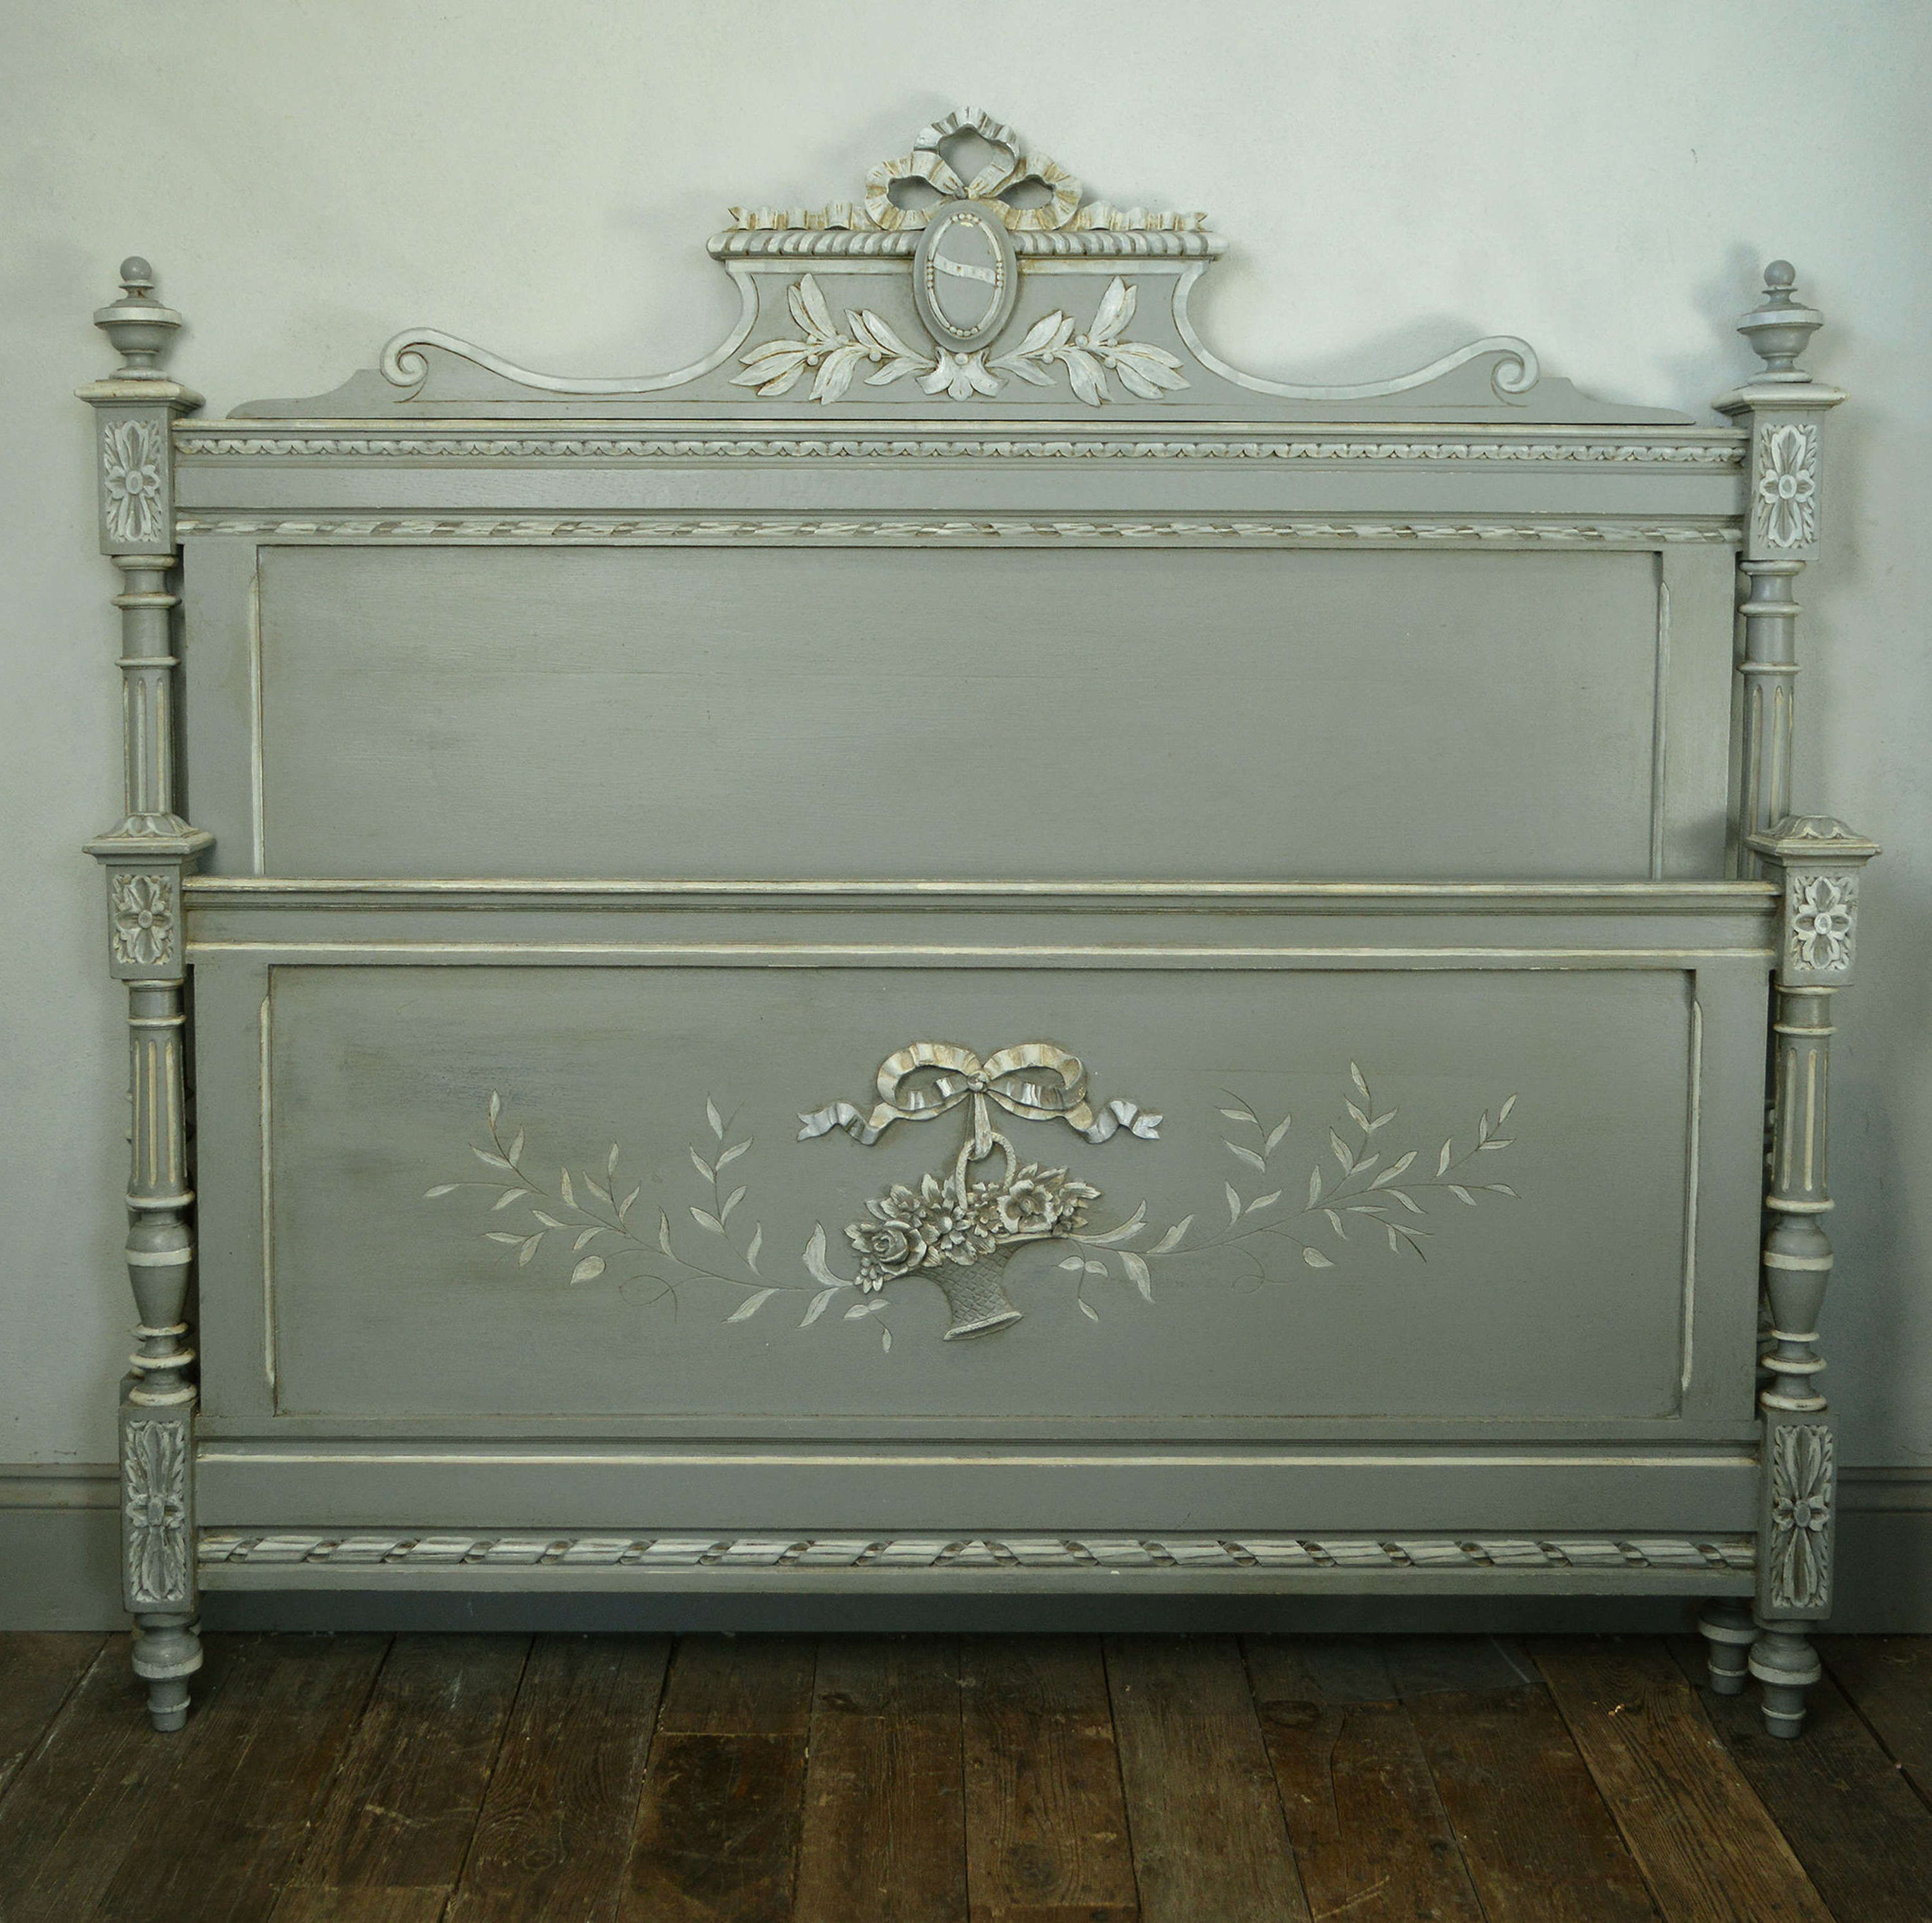 19th Century Henri II style King Size Bedstead